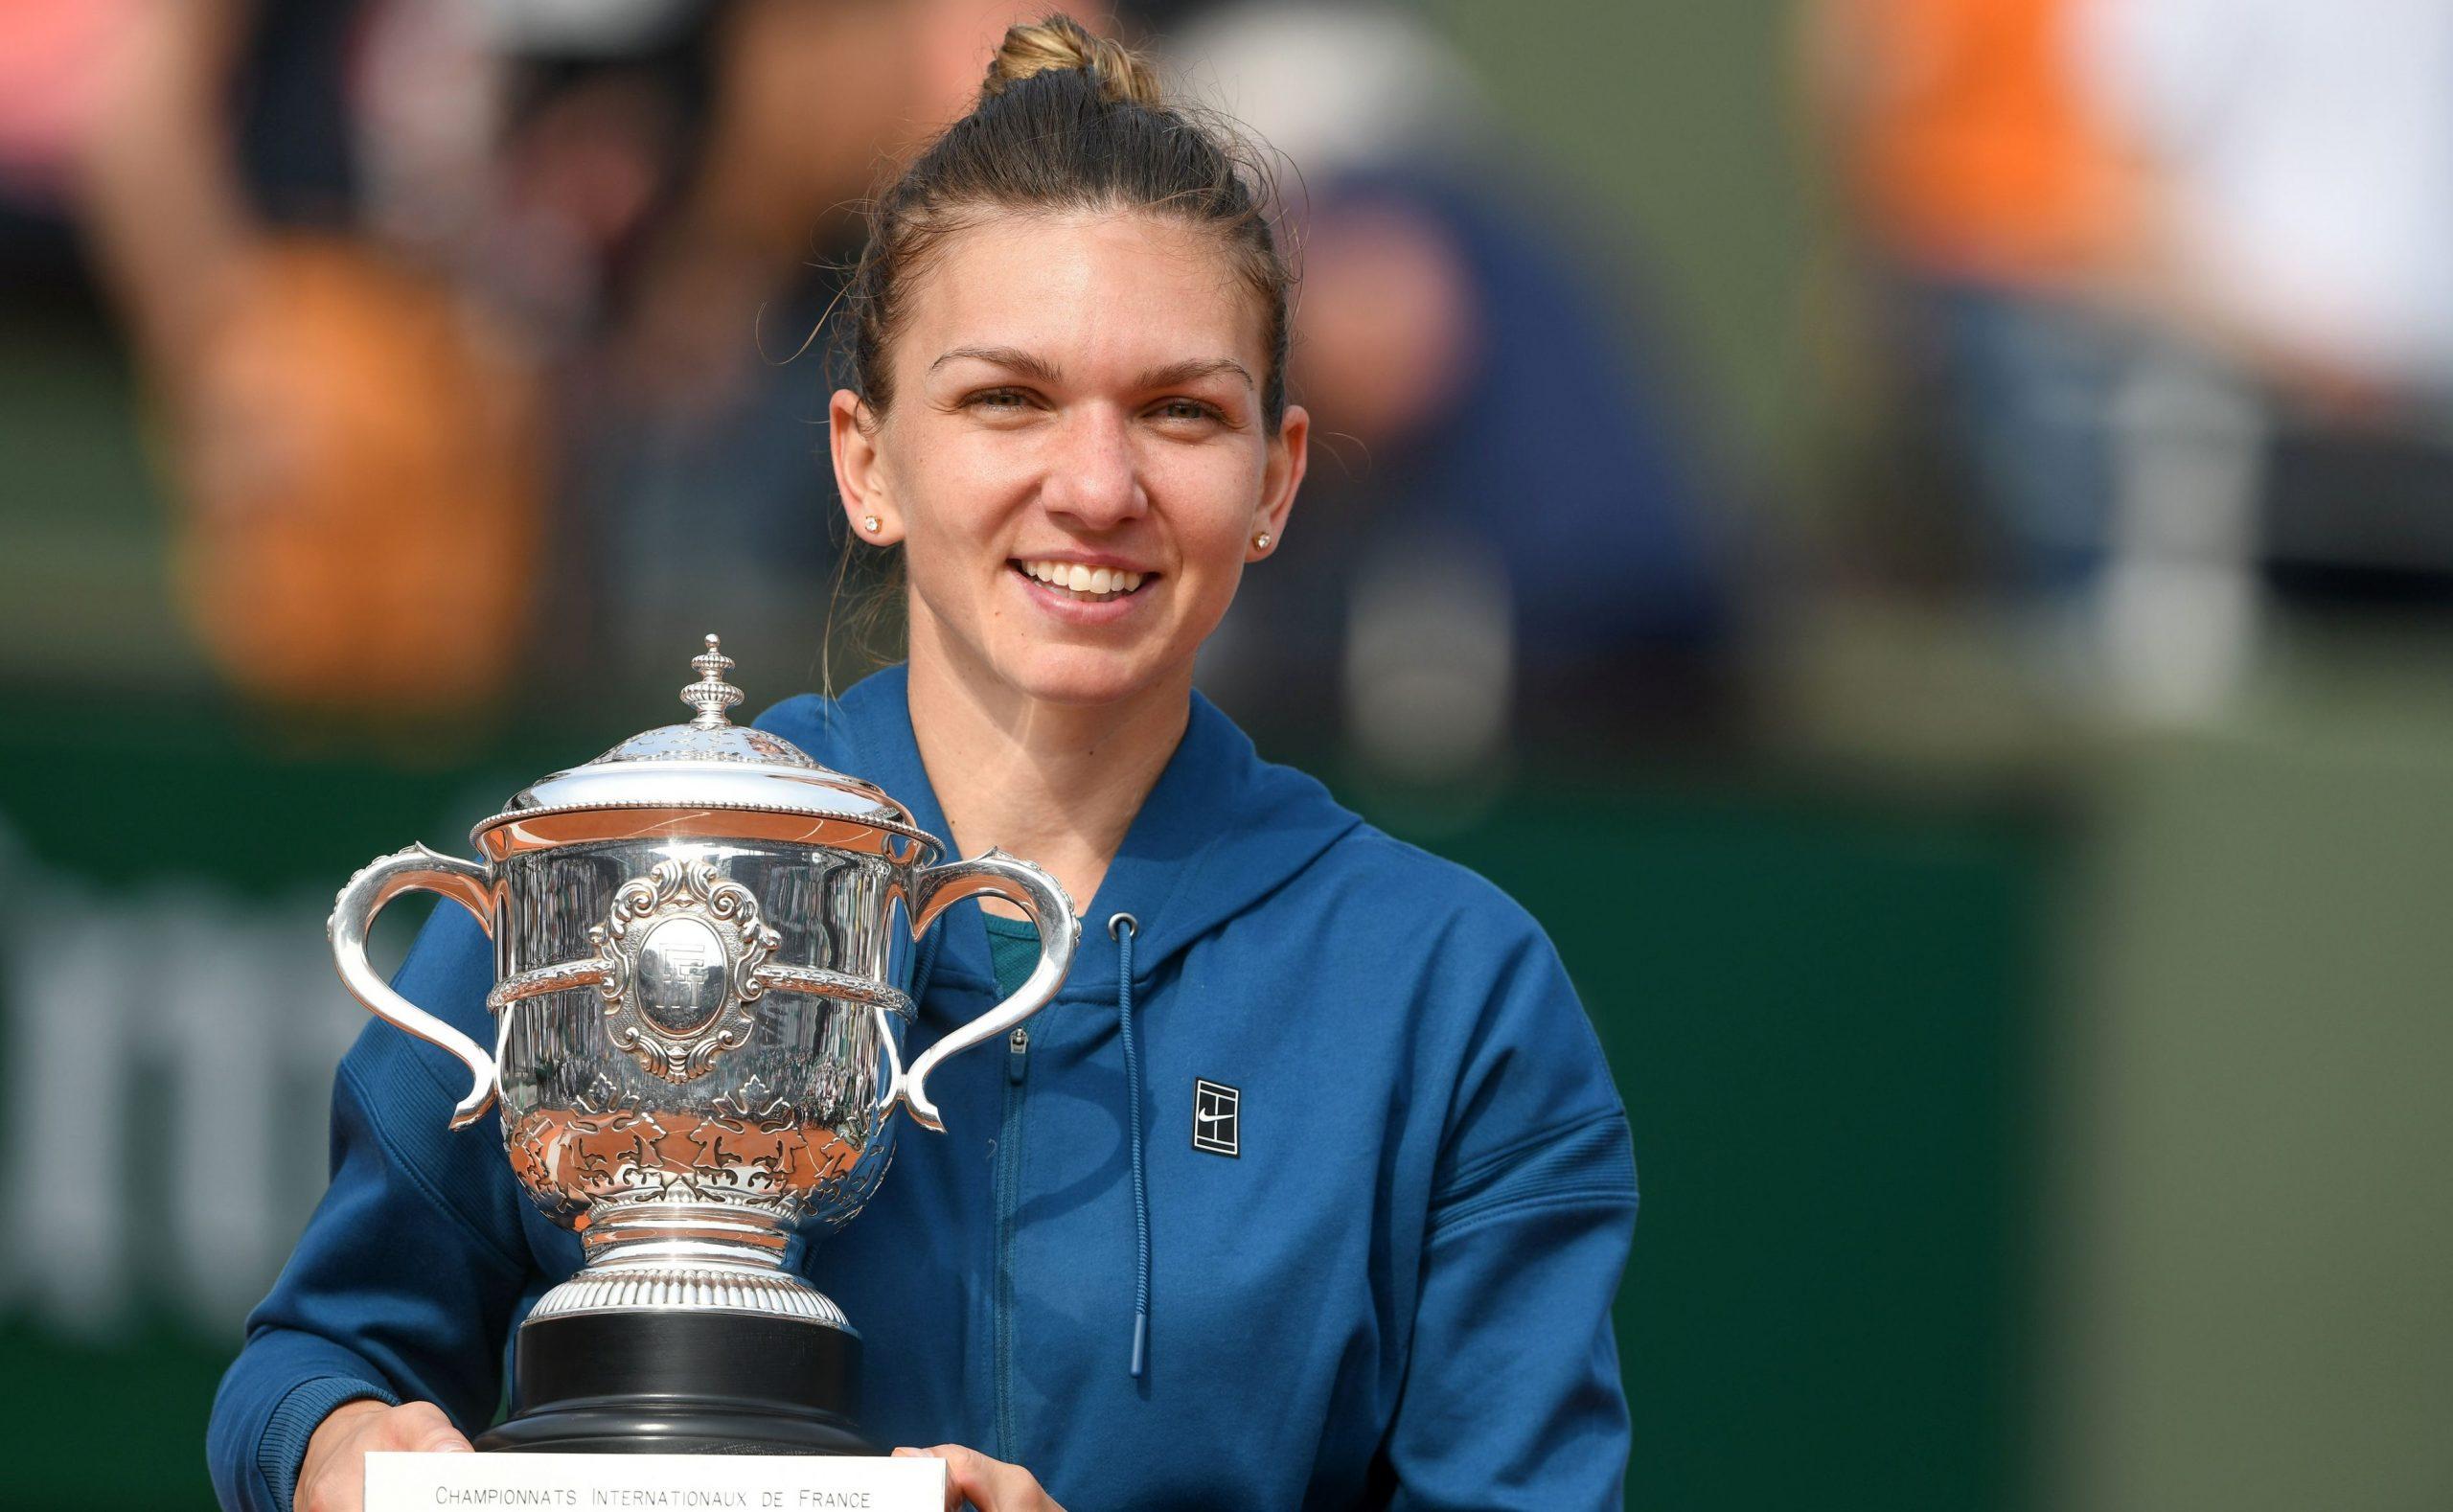 OFICIAL | Francezii au anunţat când se va disputa Roland Garros 2020!